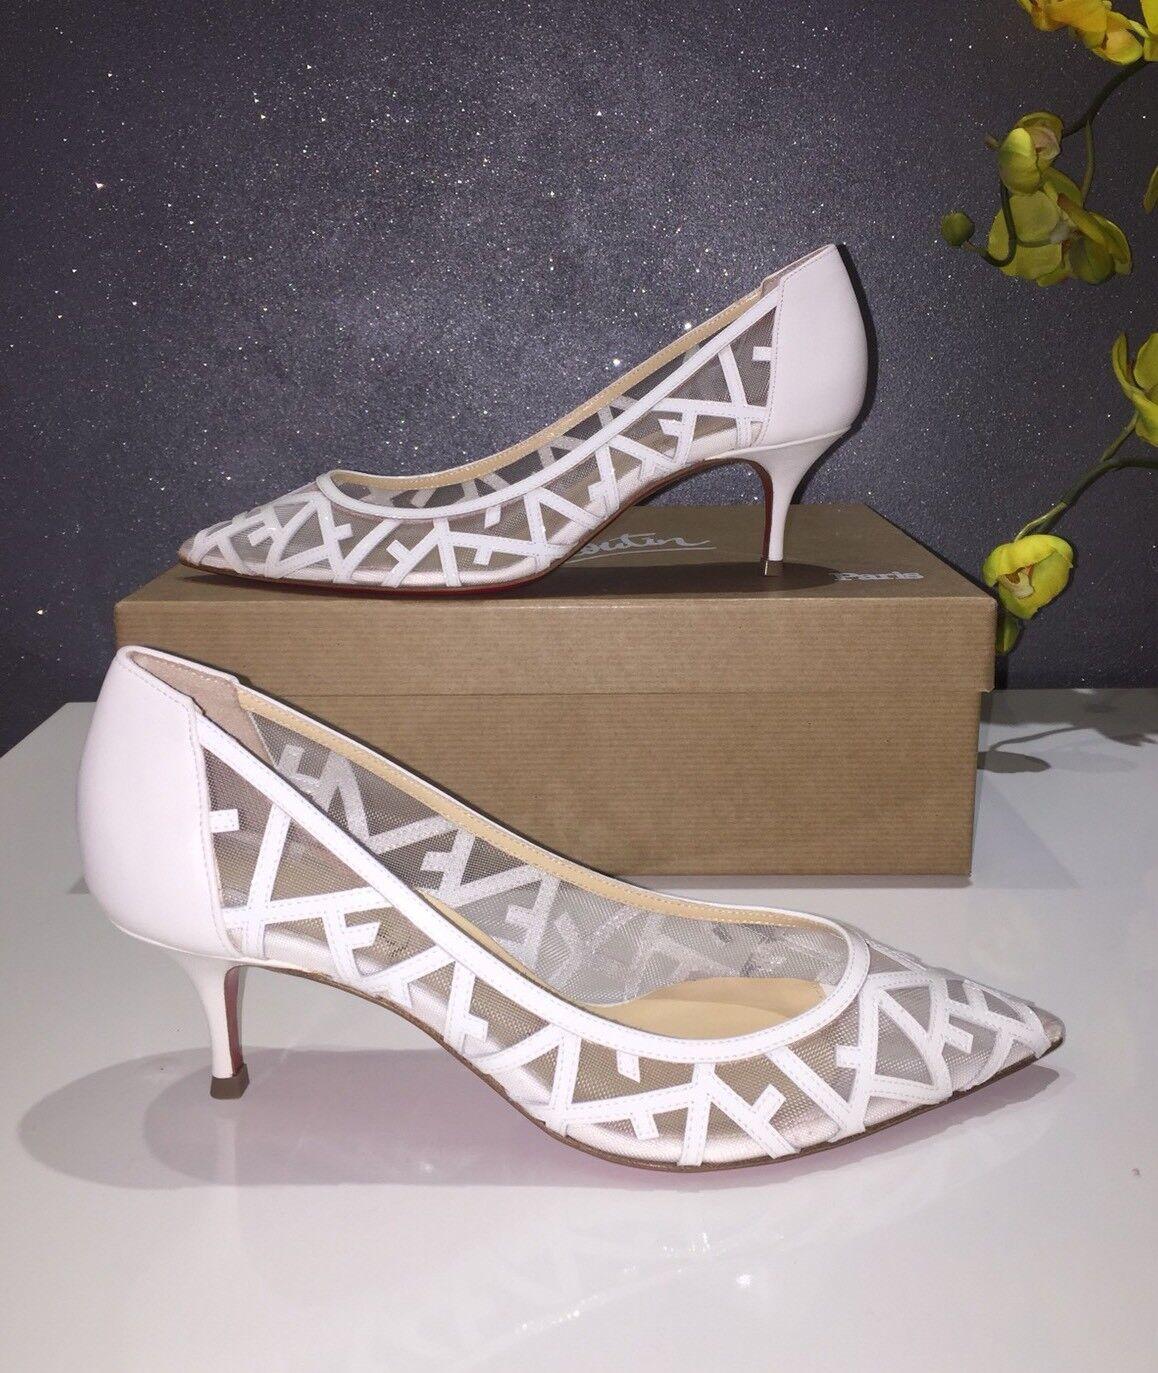 Christian Louboutin Tititata bianca Mesh Bridal Pump 555mm Dimensione  5.5 US  895  vanno a ruba